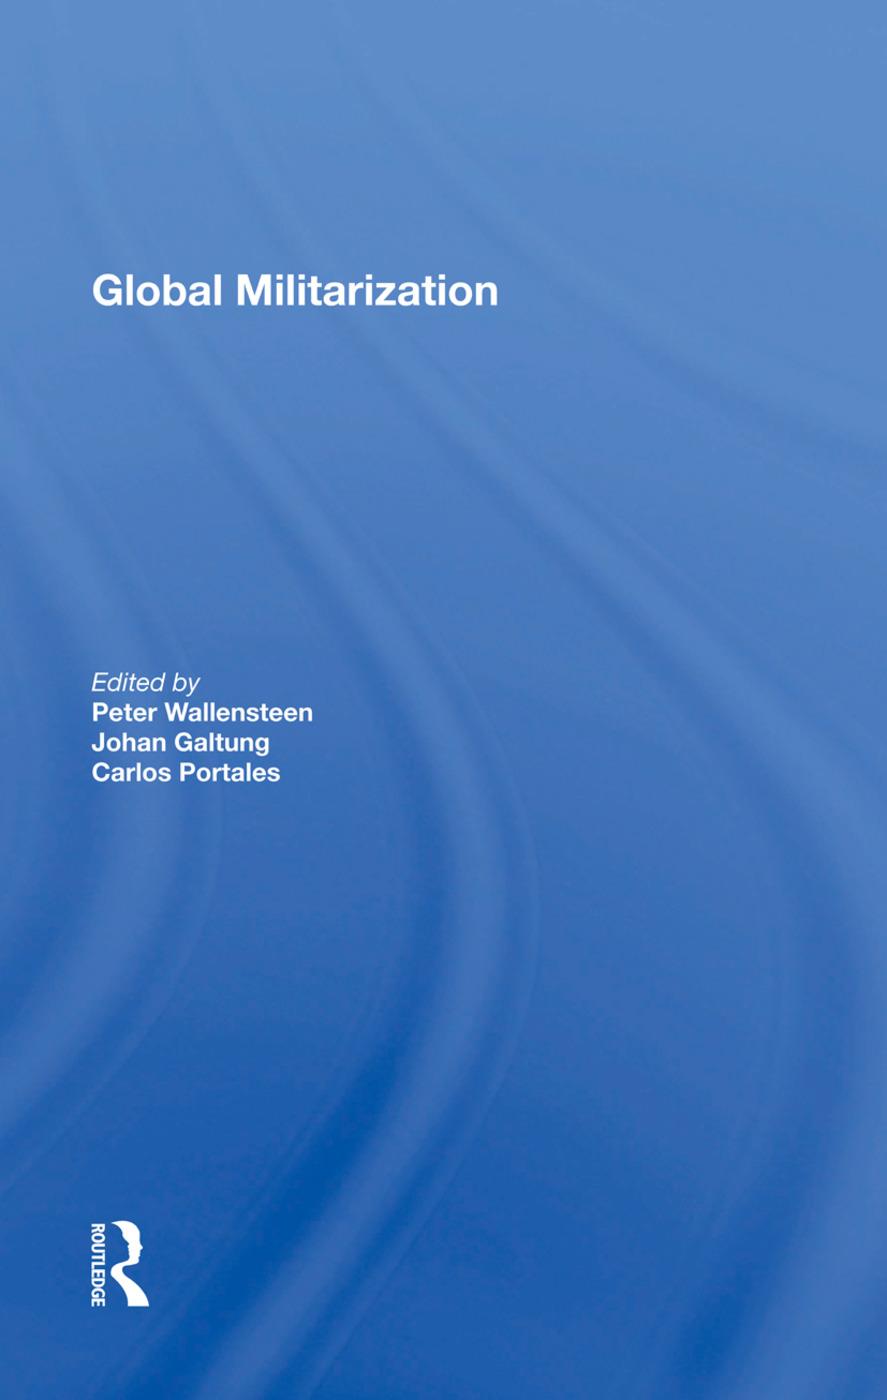 Global Militarization